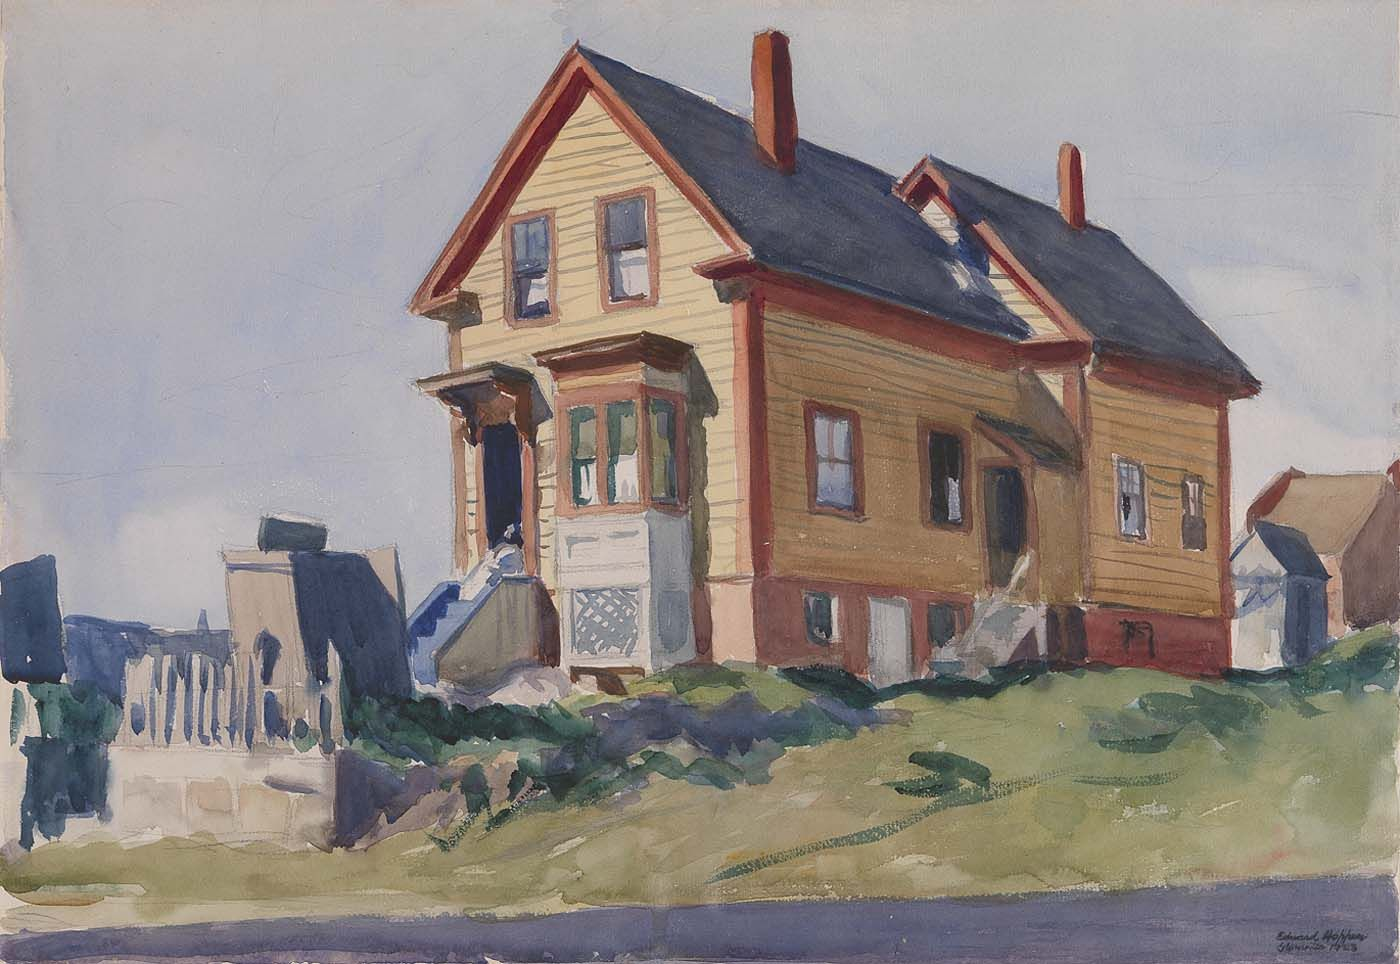 Edward Hopper - Painting Realism House In Italian